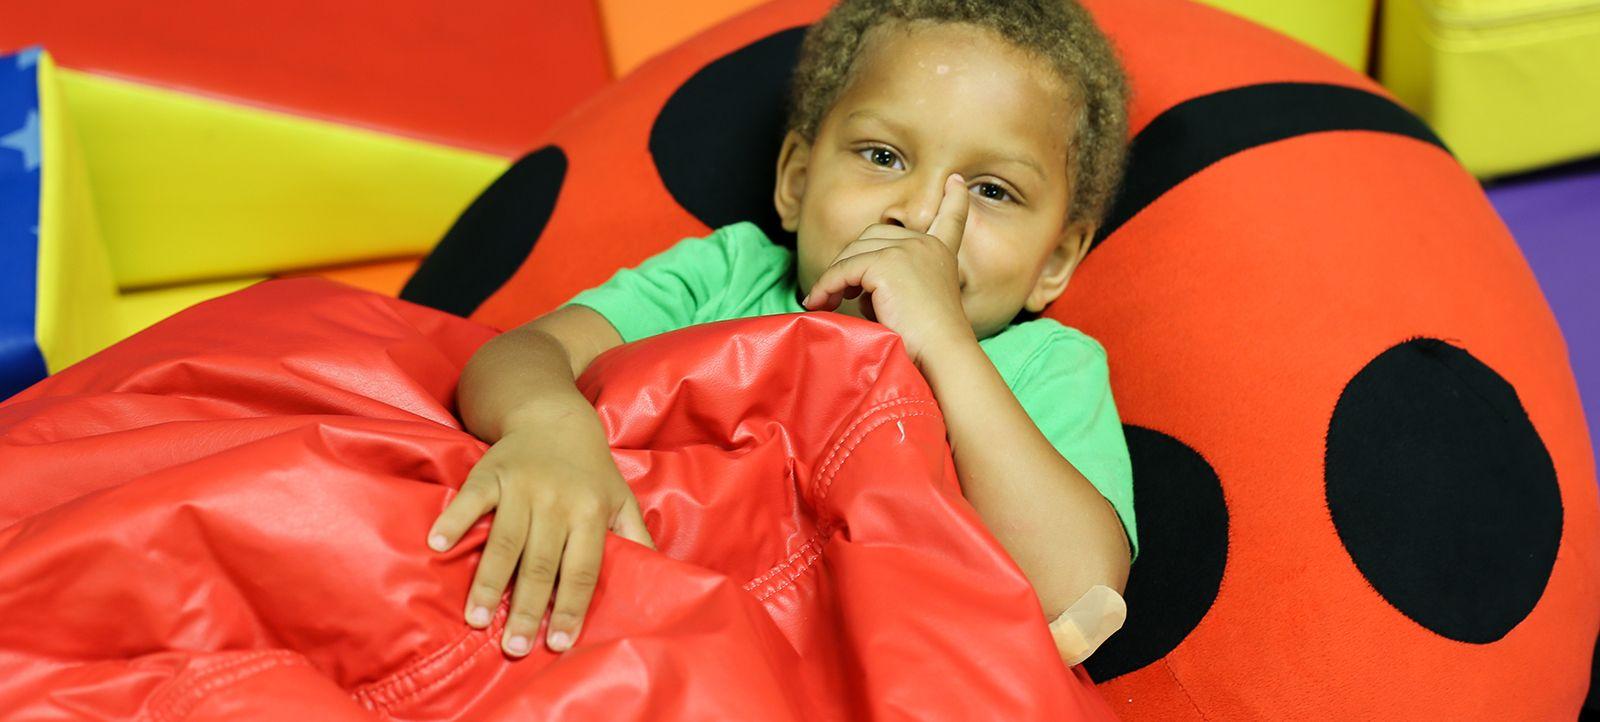 Playtime Helps Children Rise